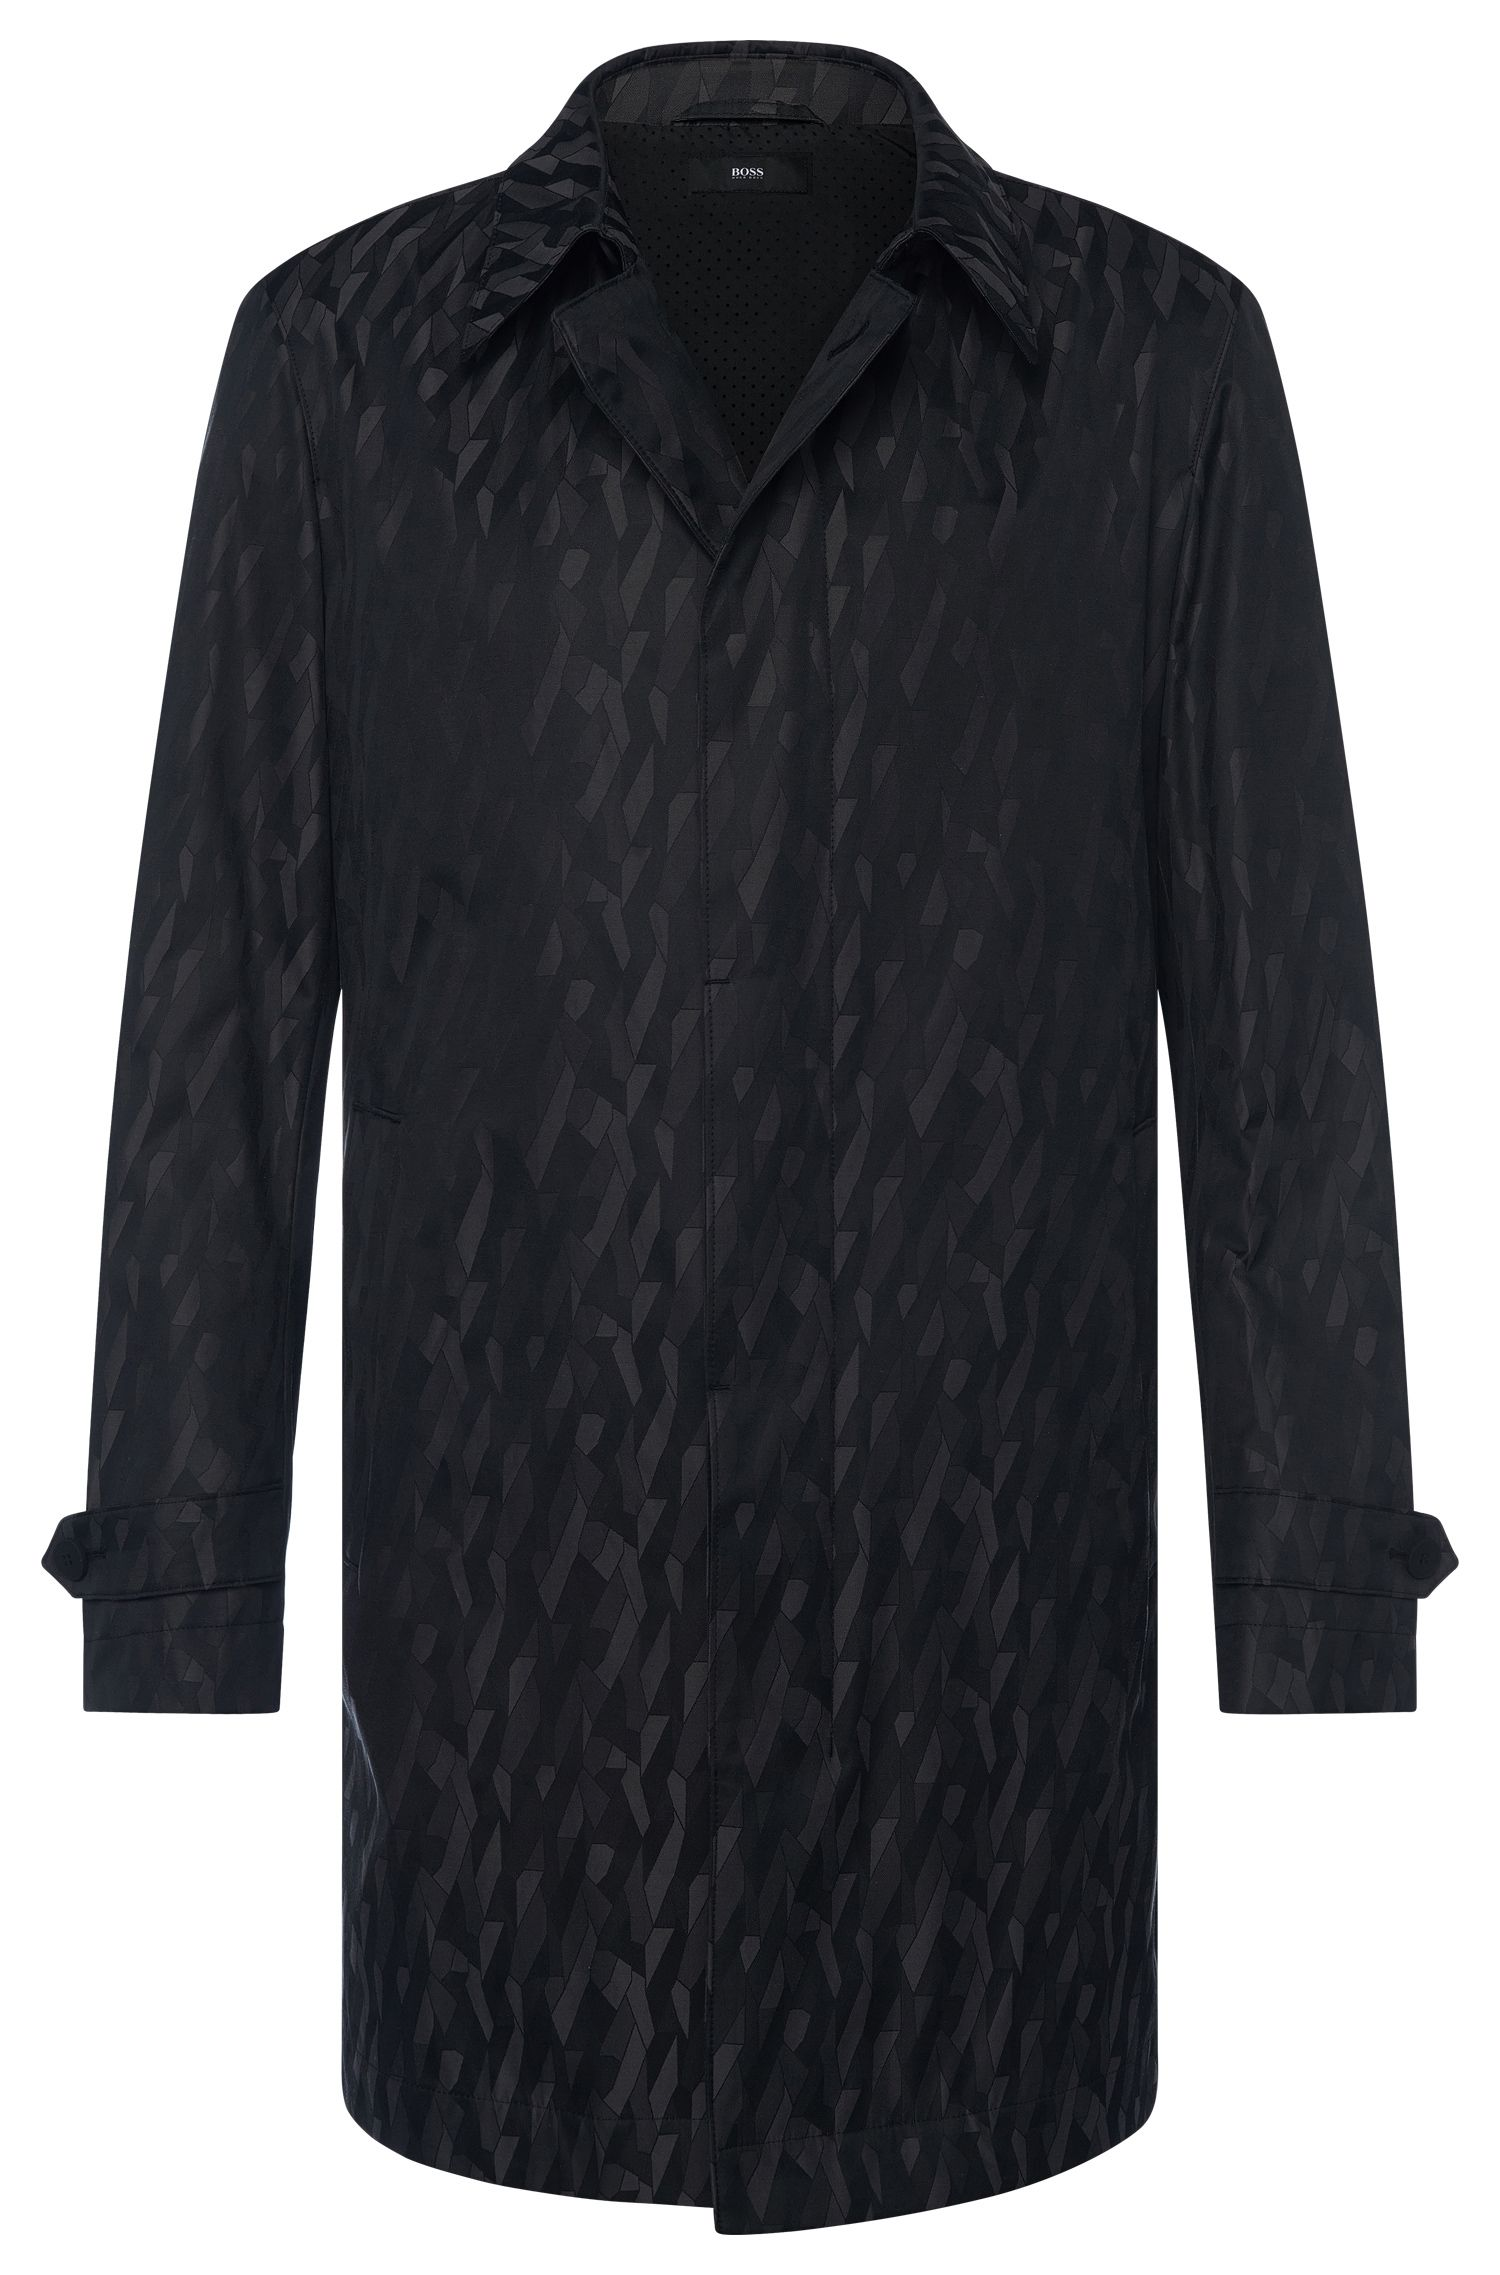 Cotton Blend Packable Water-Repellent Car Coat | Garret